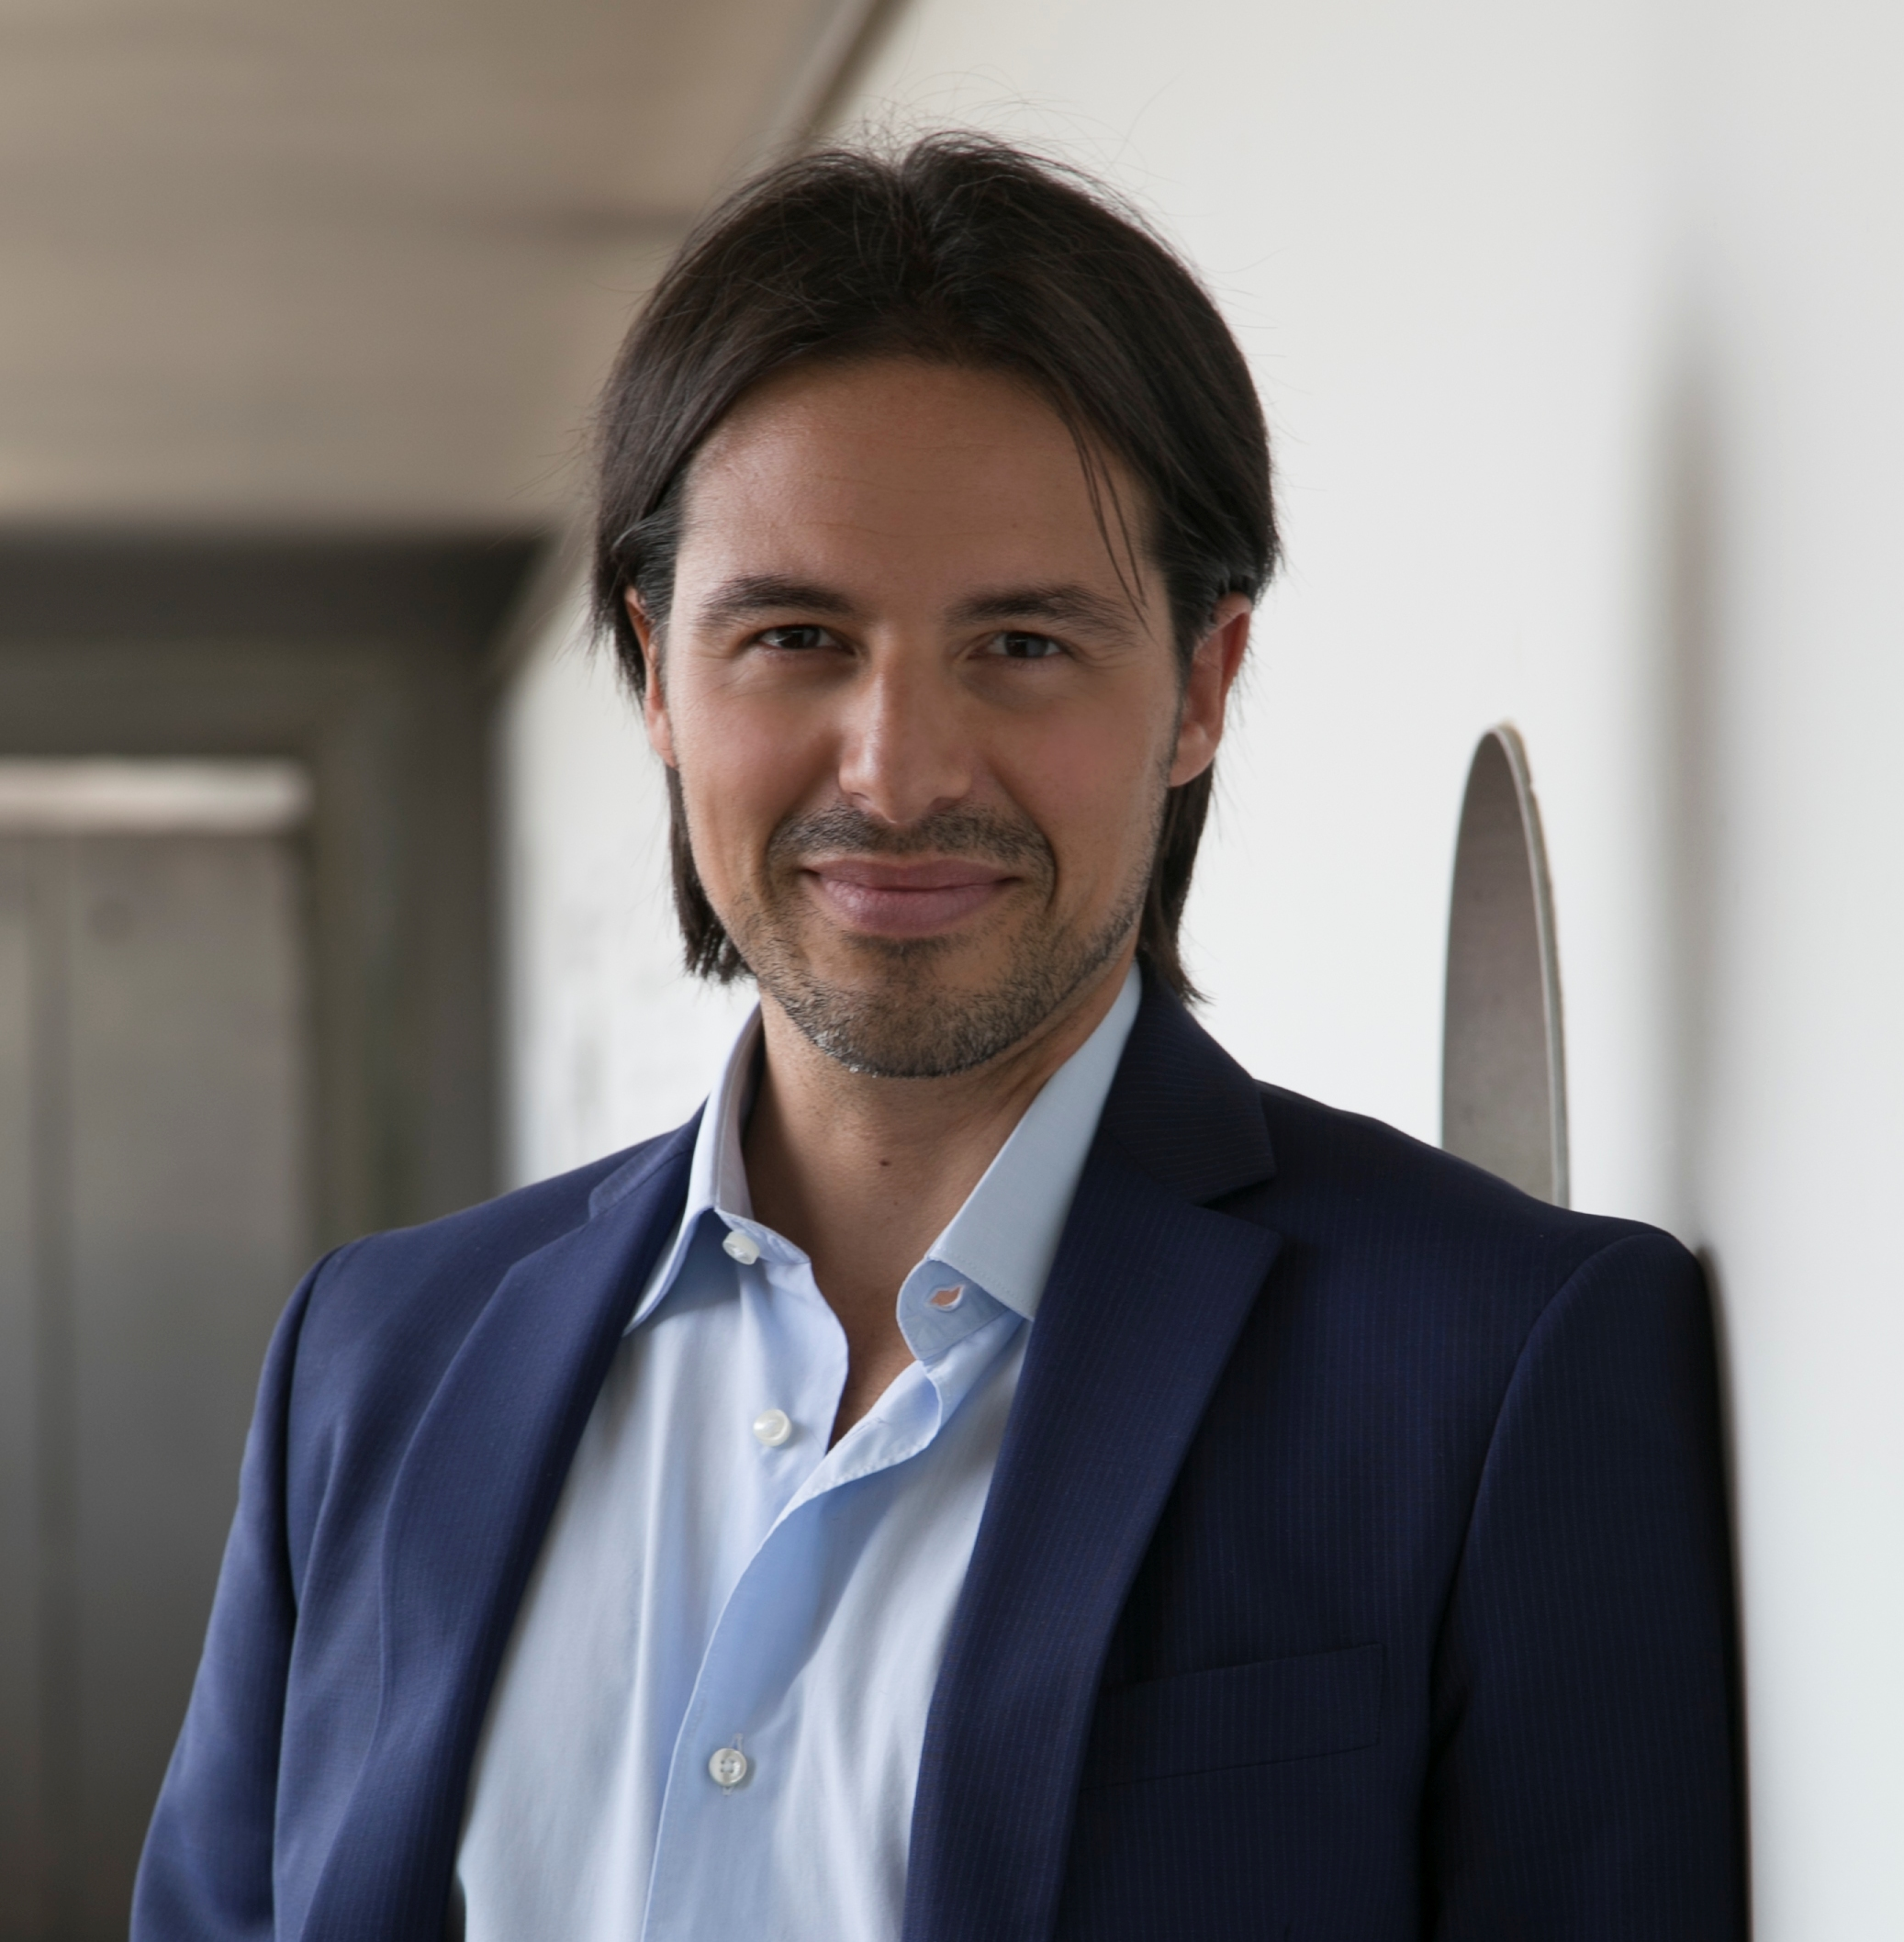 Davide Merletto